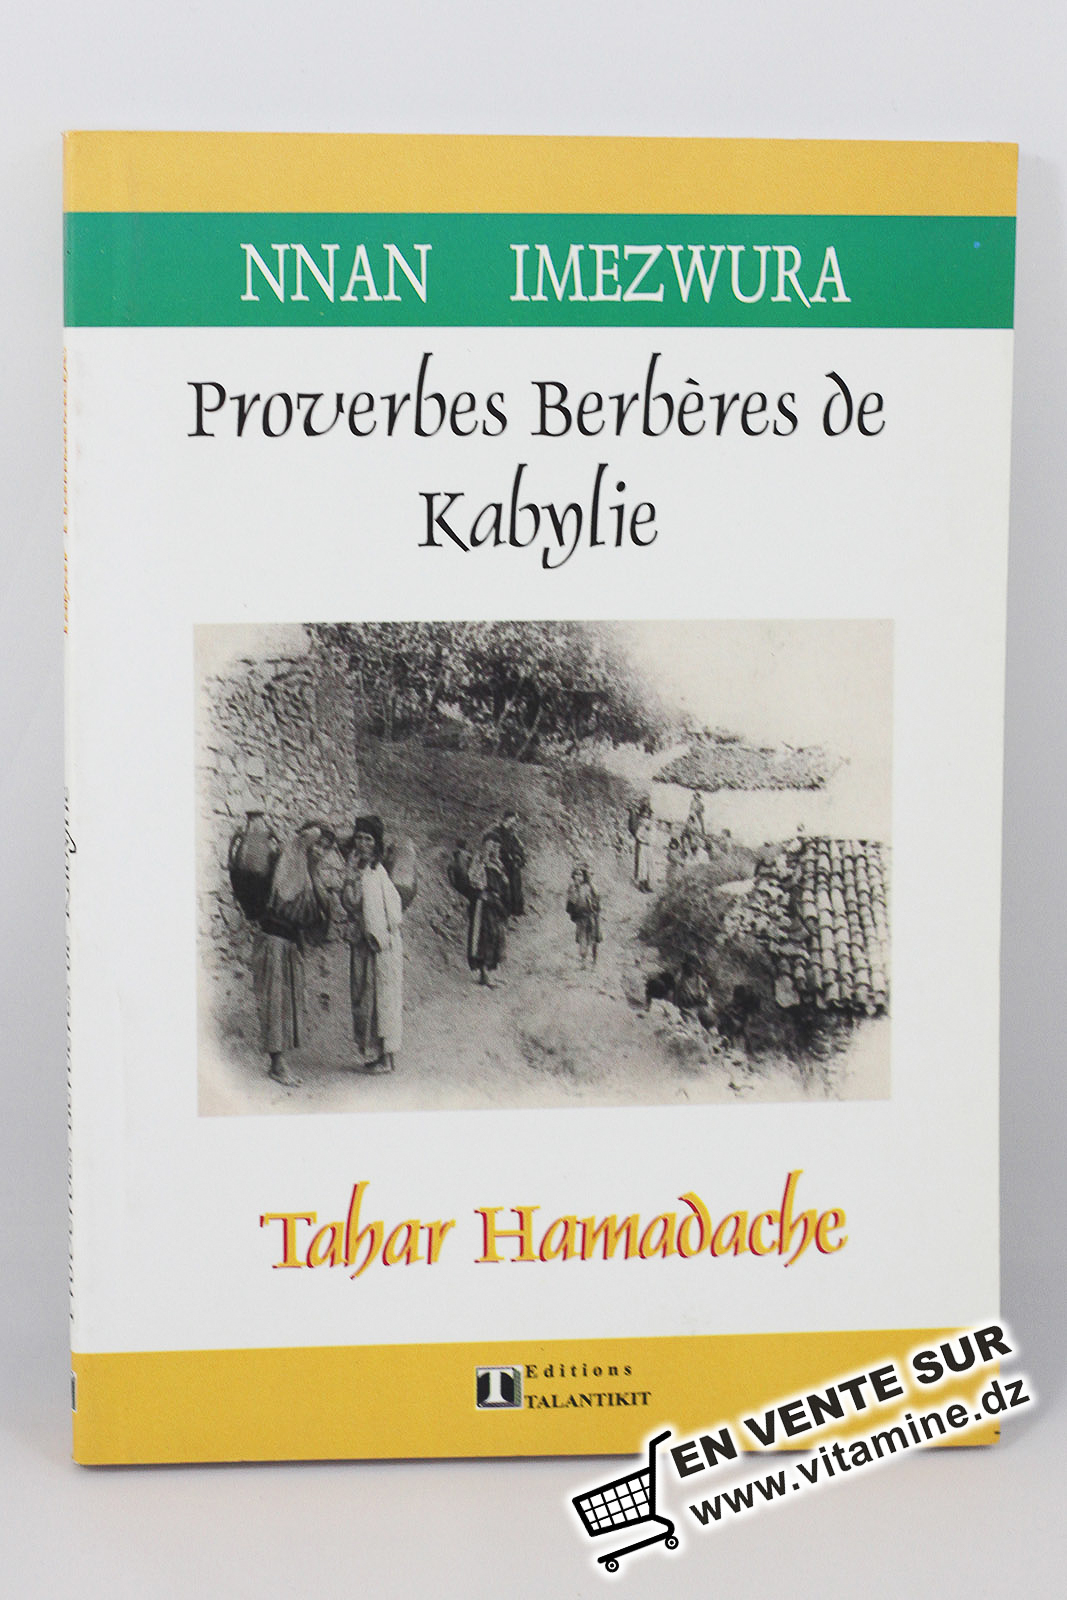 Tahar Hamadache - Proverbes Berbères de Kabylie